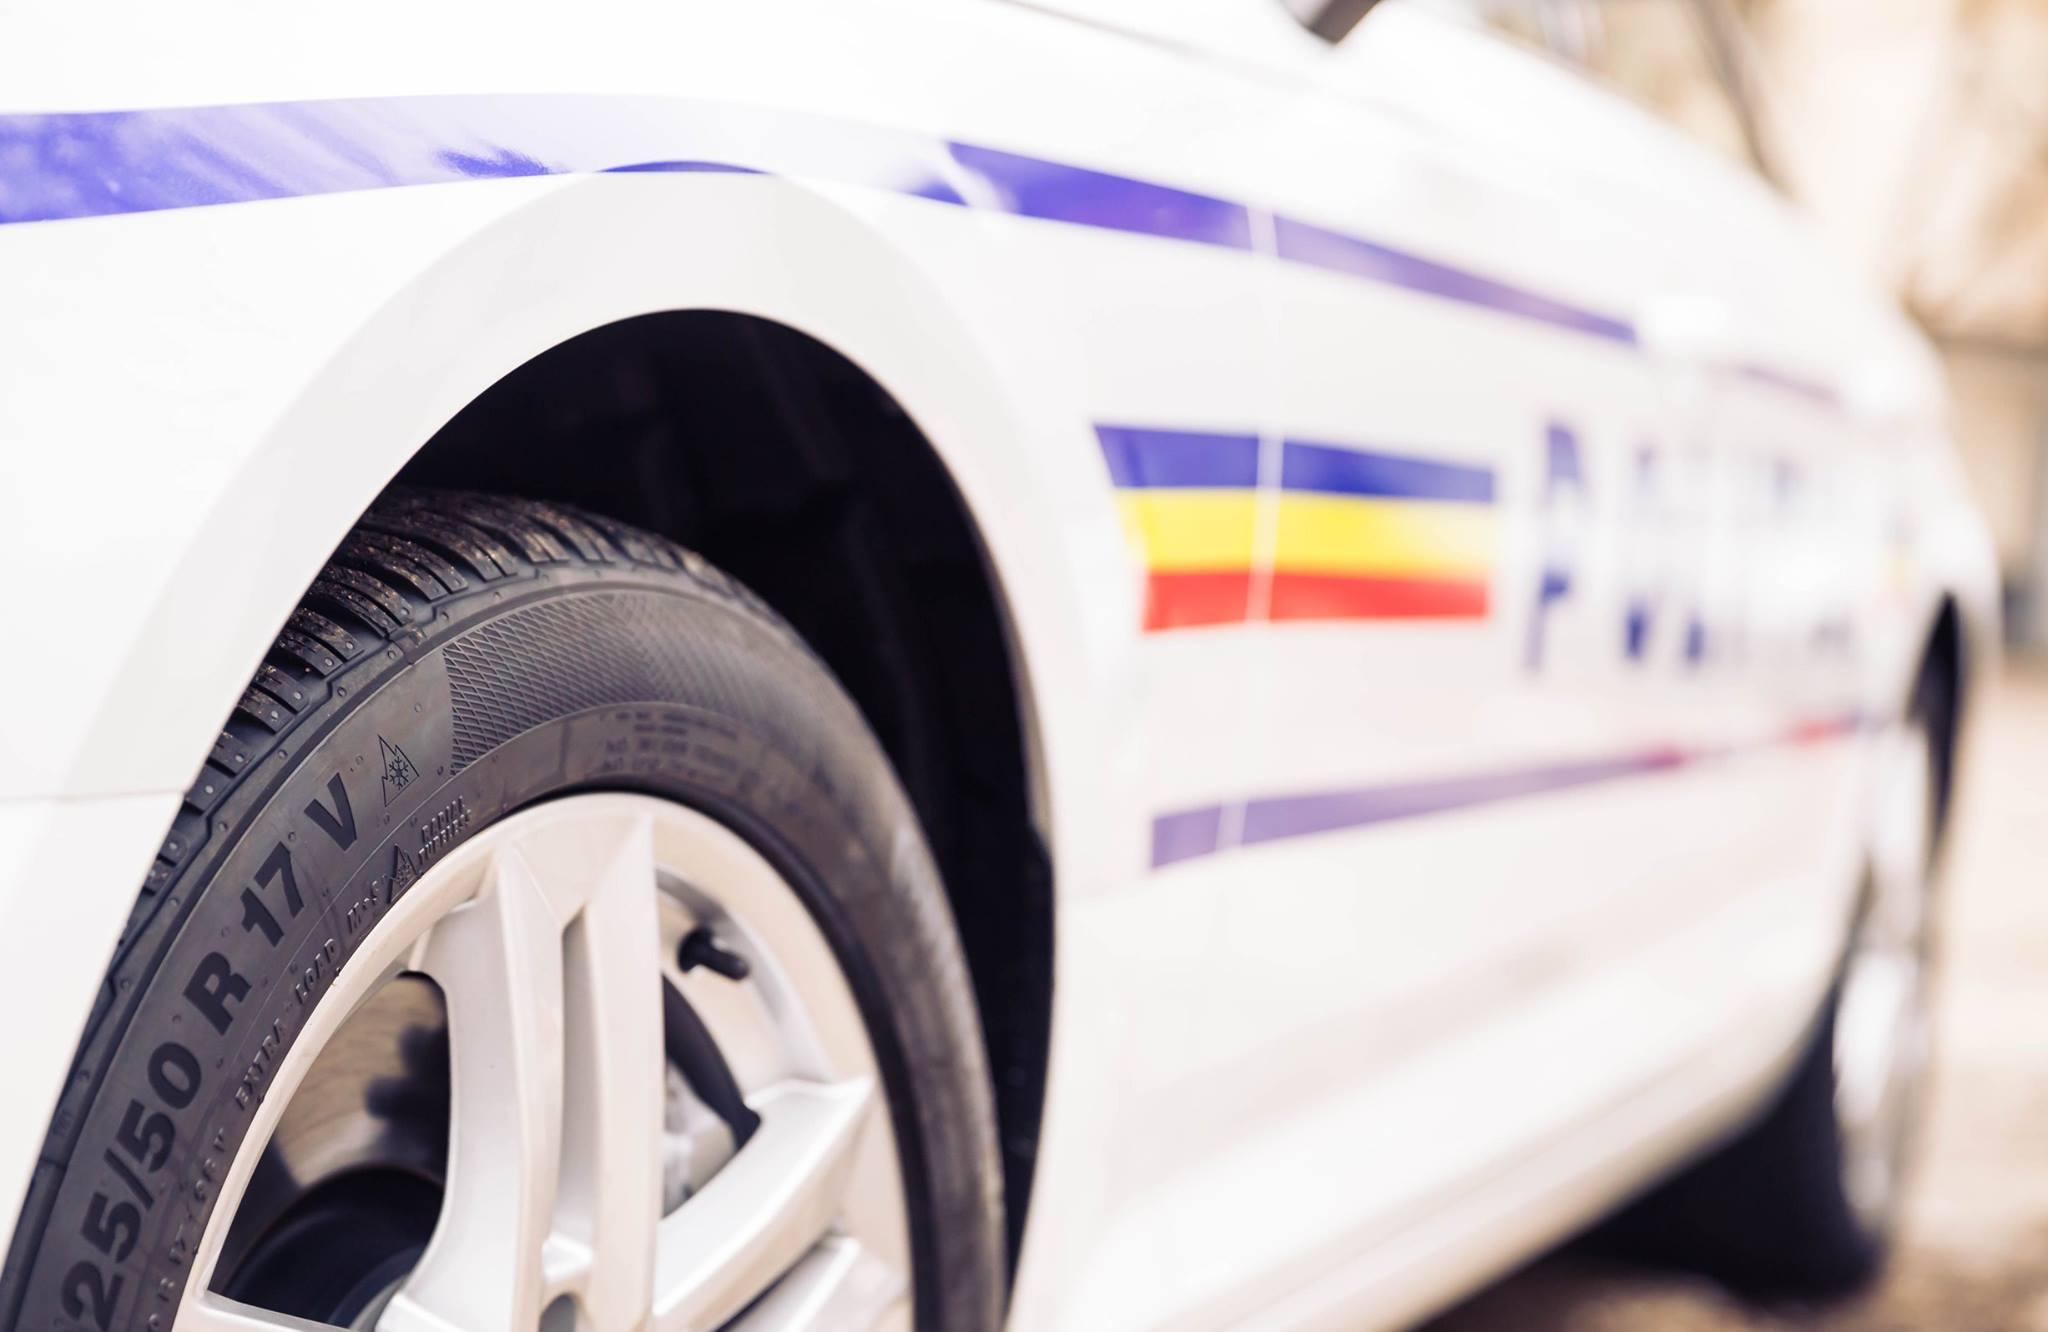 Doua fete, ranite dupa ce au fost lovite de o masina. Soferul fugar a fost prins. Are 15 ani si era baut